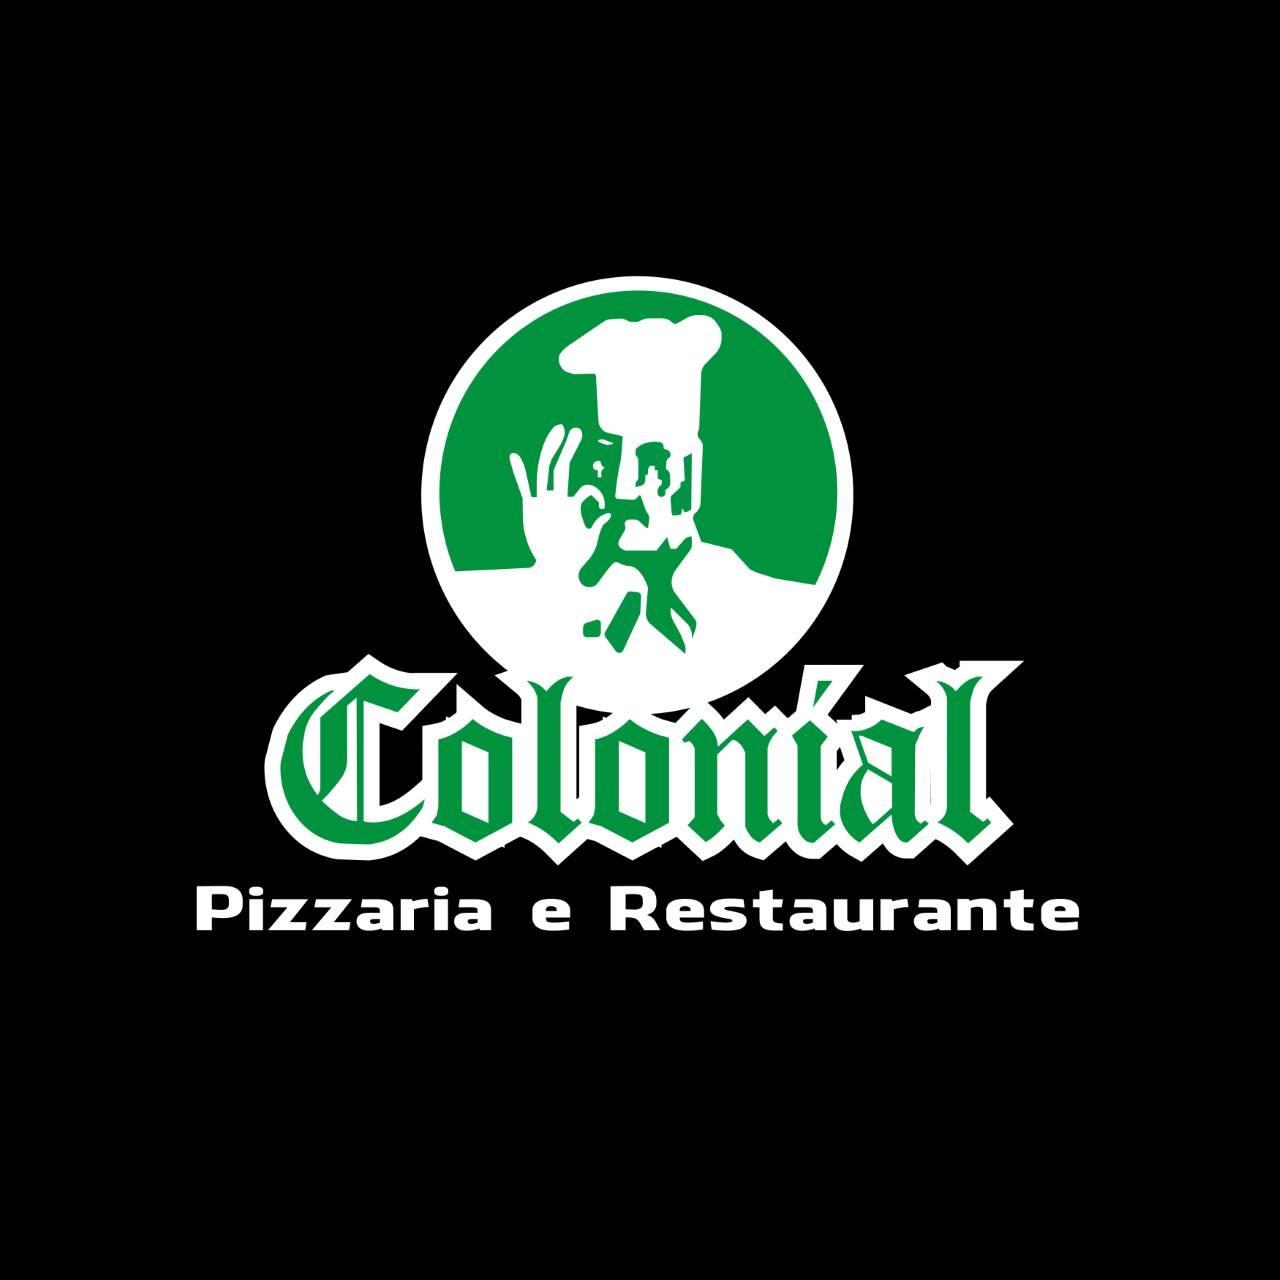 Colonial Restaurant e Pizzaria